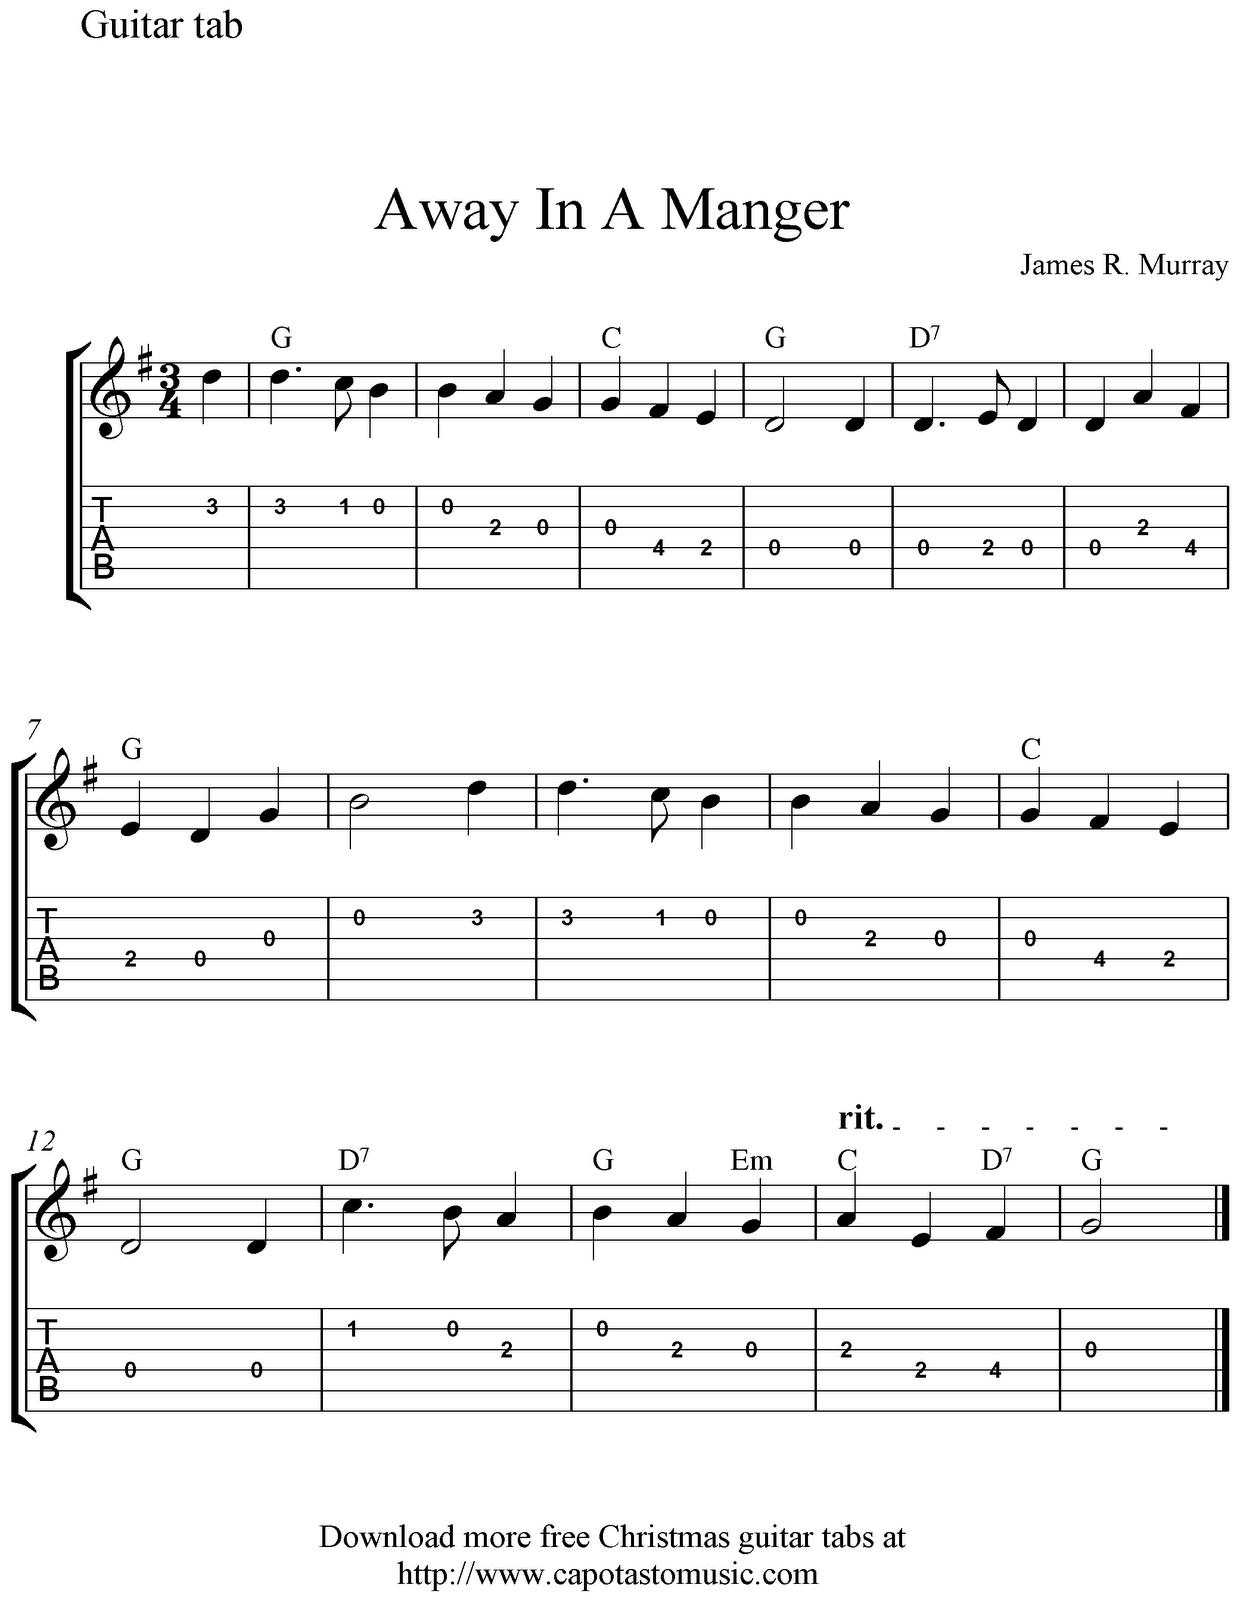 awayinamangerguitartabpng 12371600 pixels  Guitar and